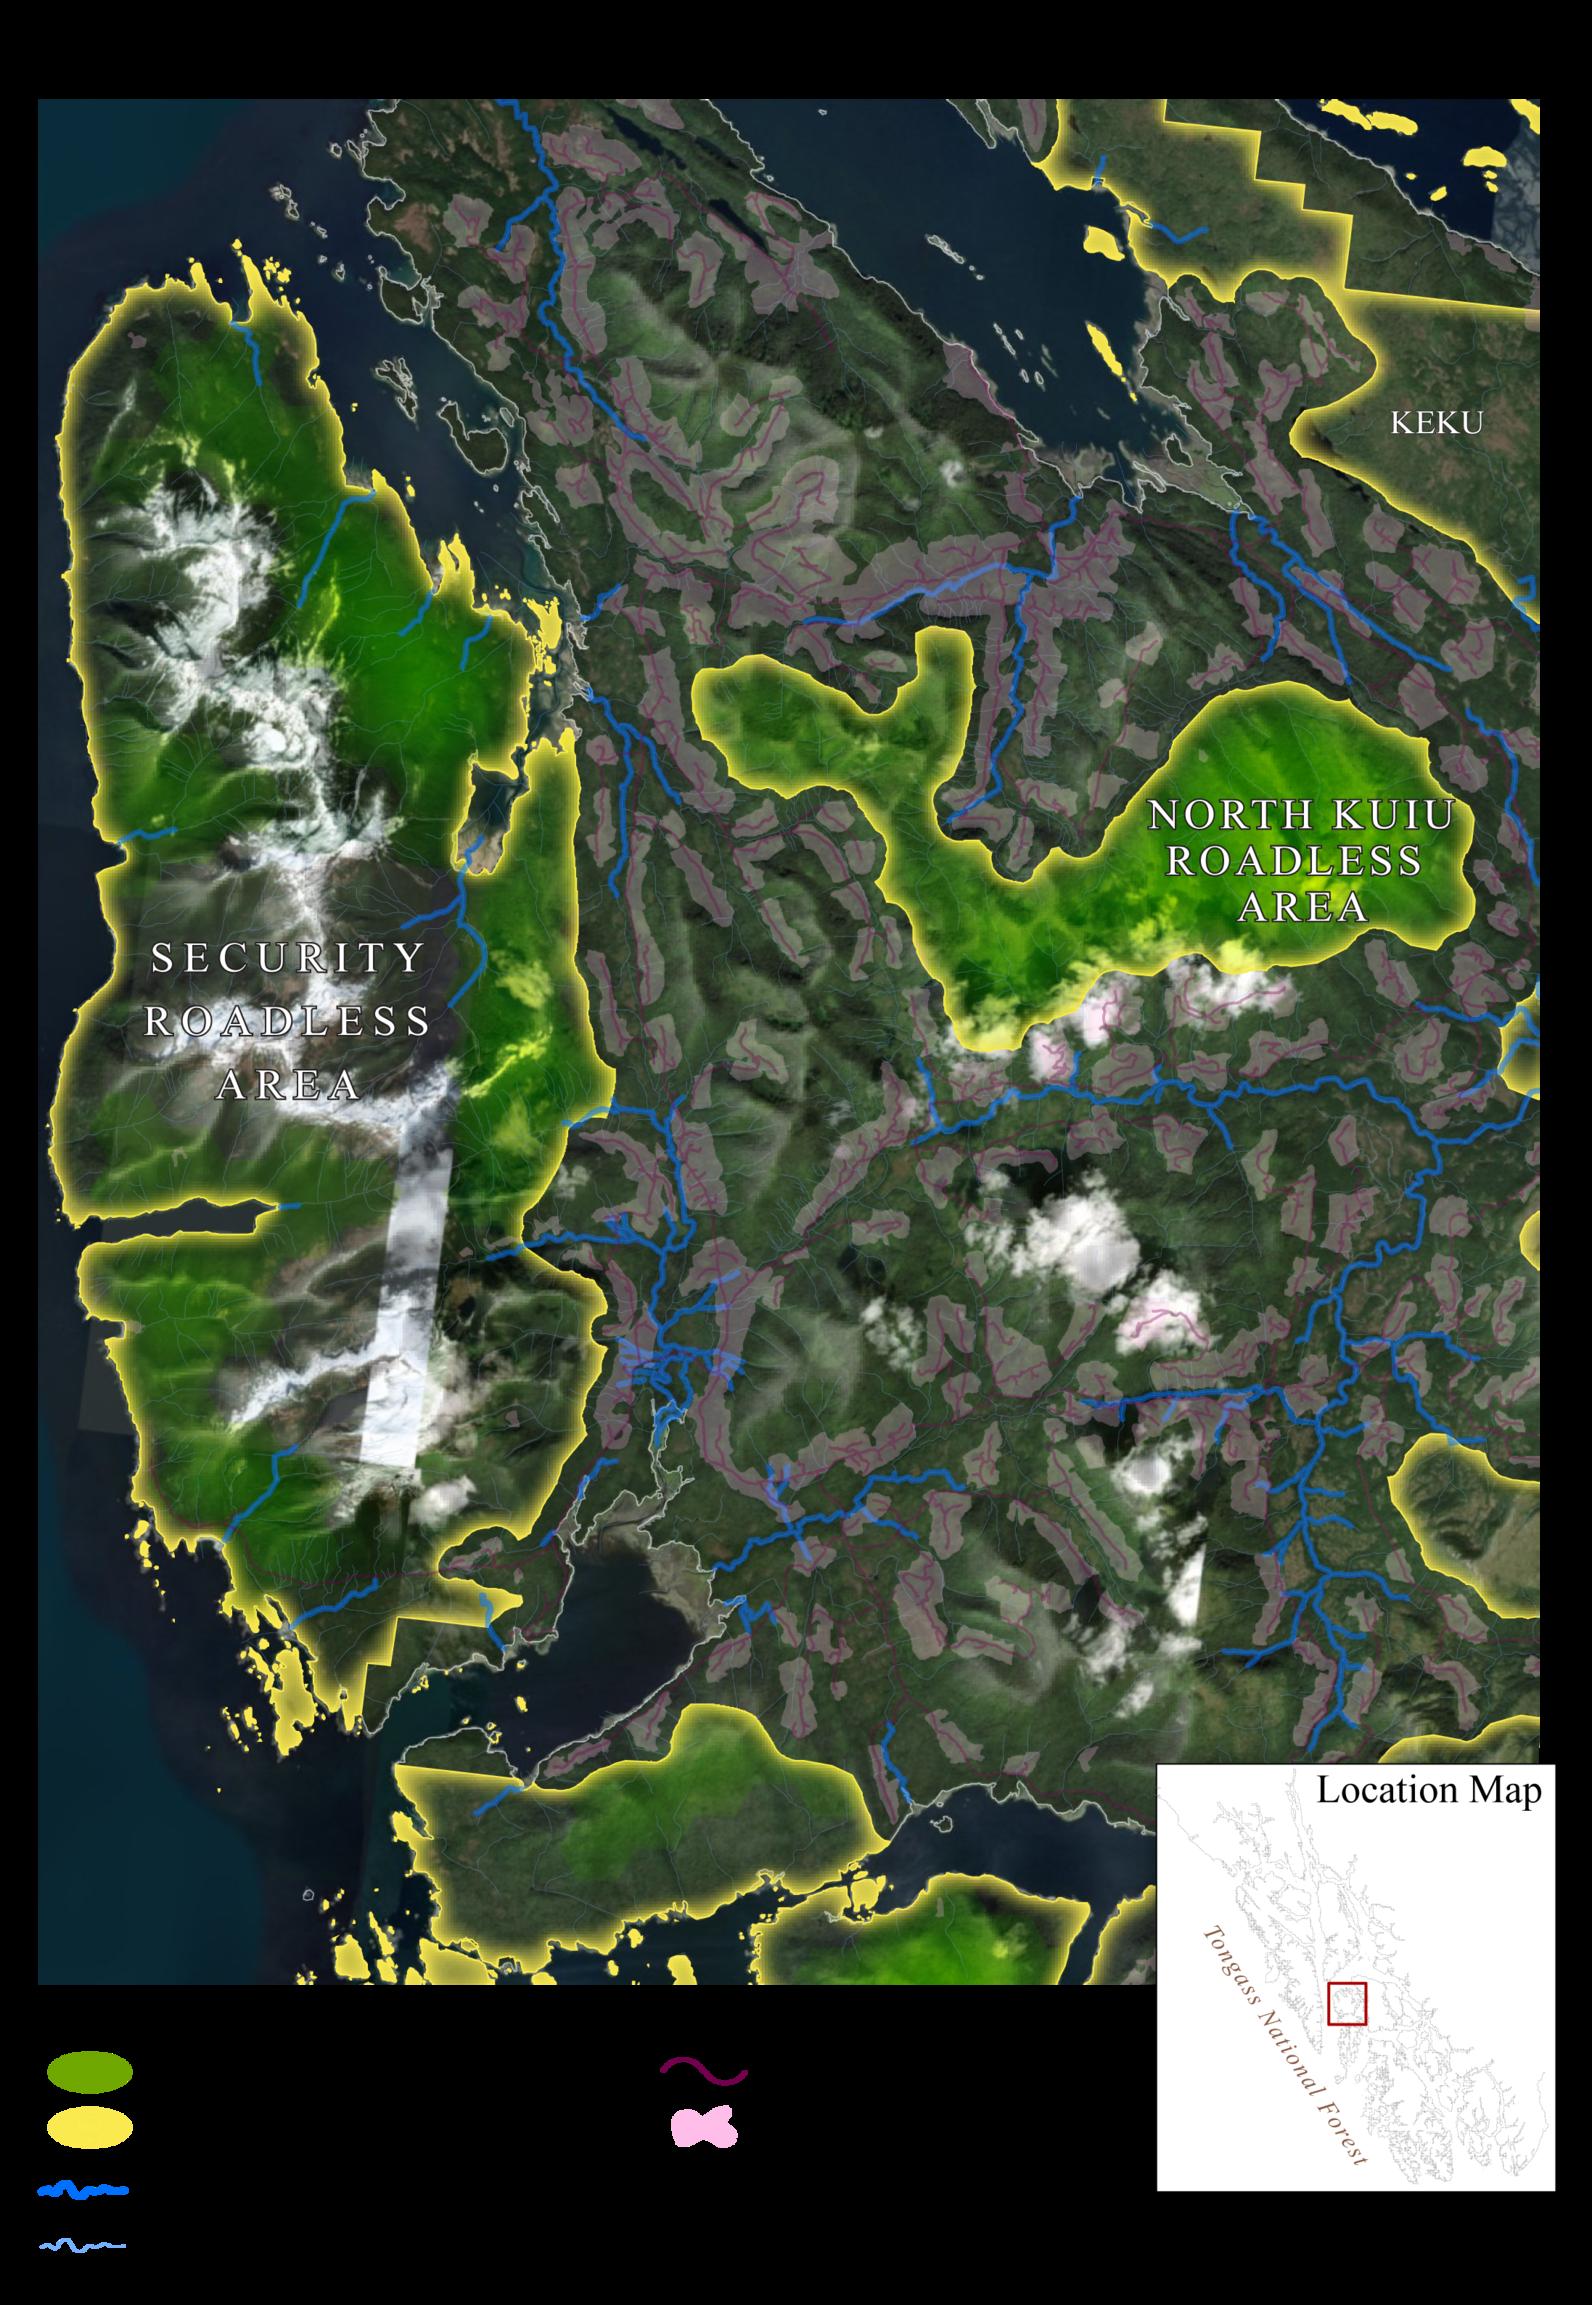 North Kuiu Roadless Area